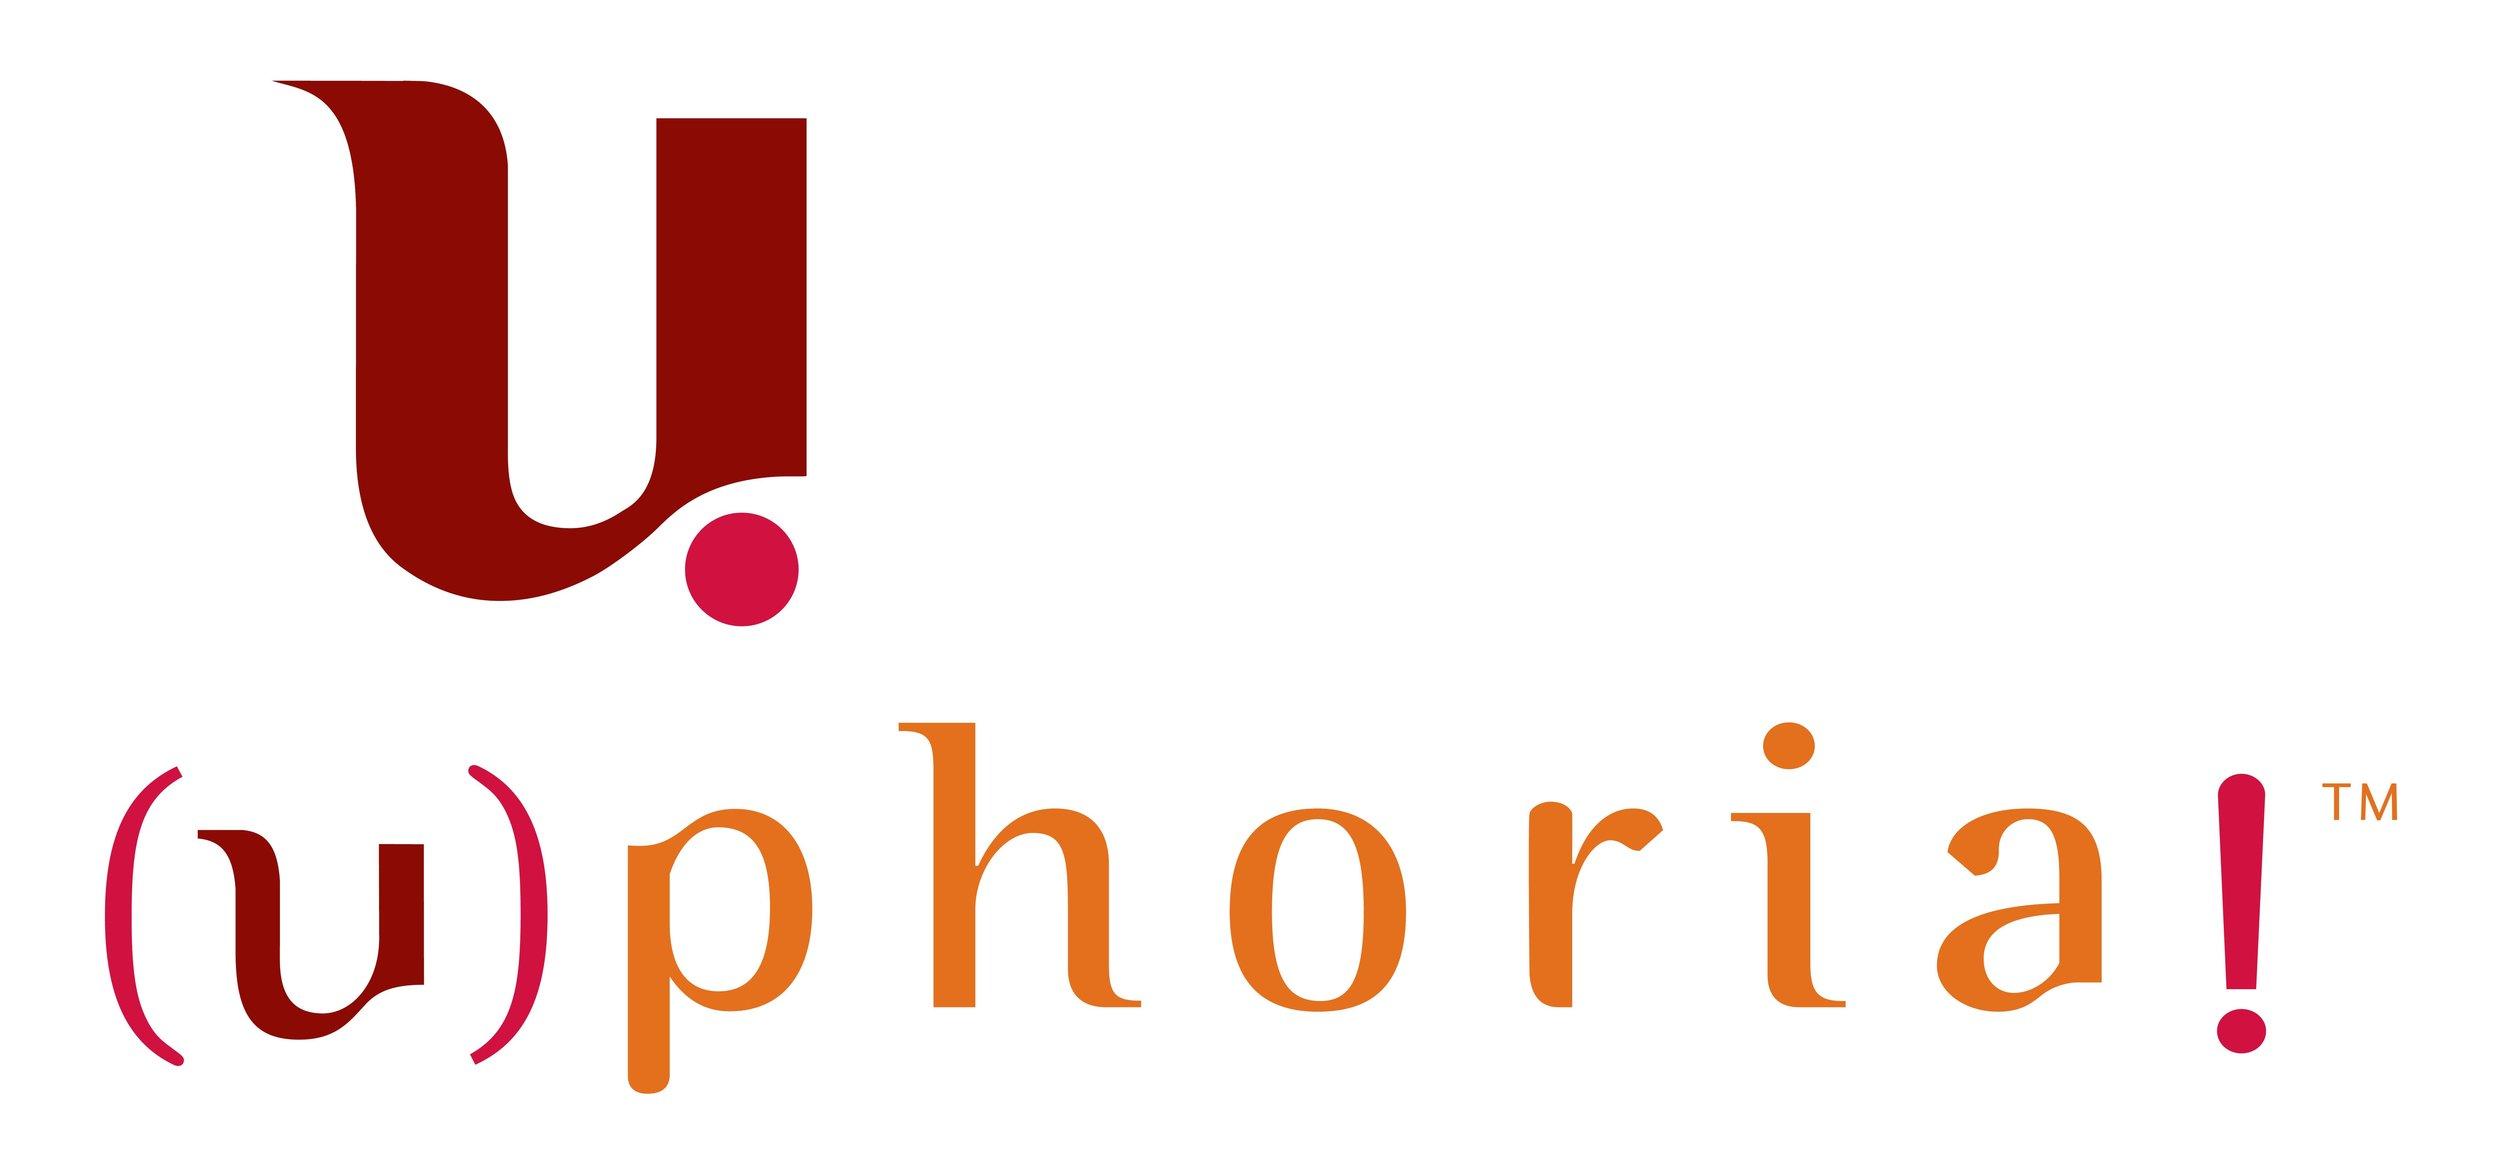 uphoria-logo.jpg